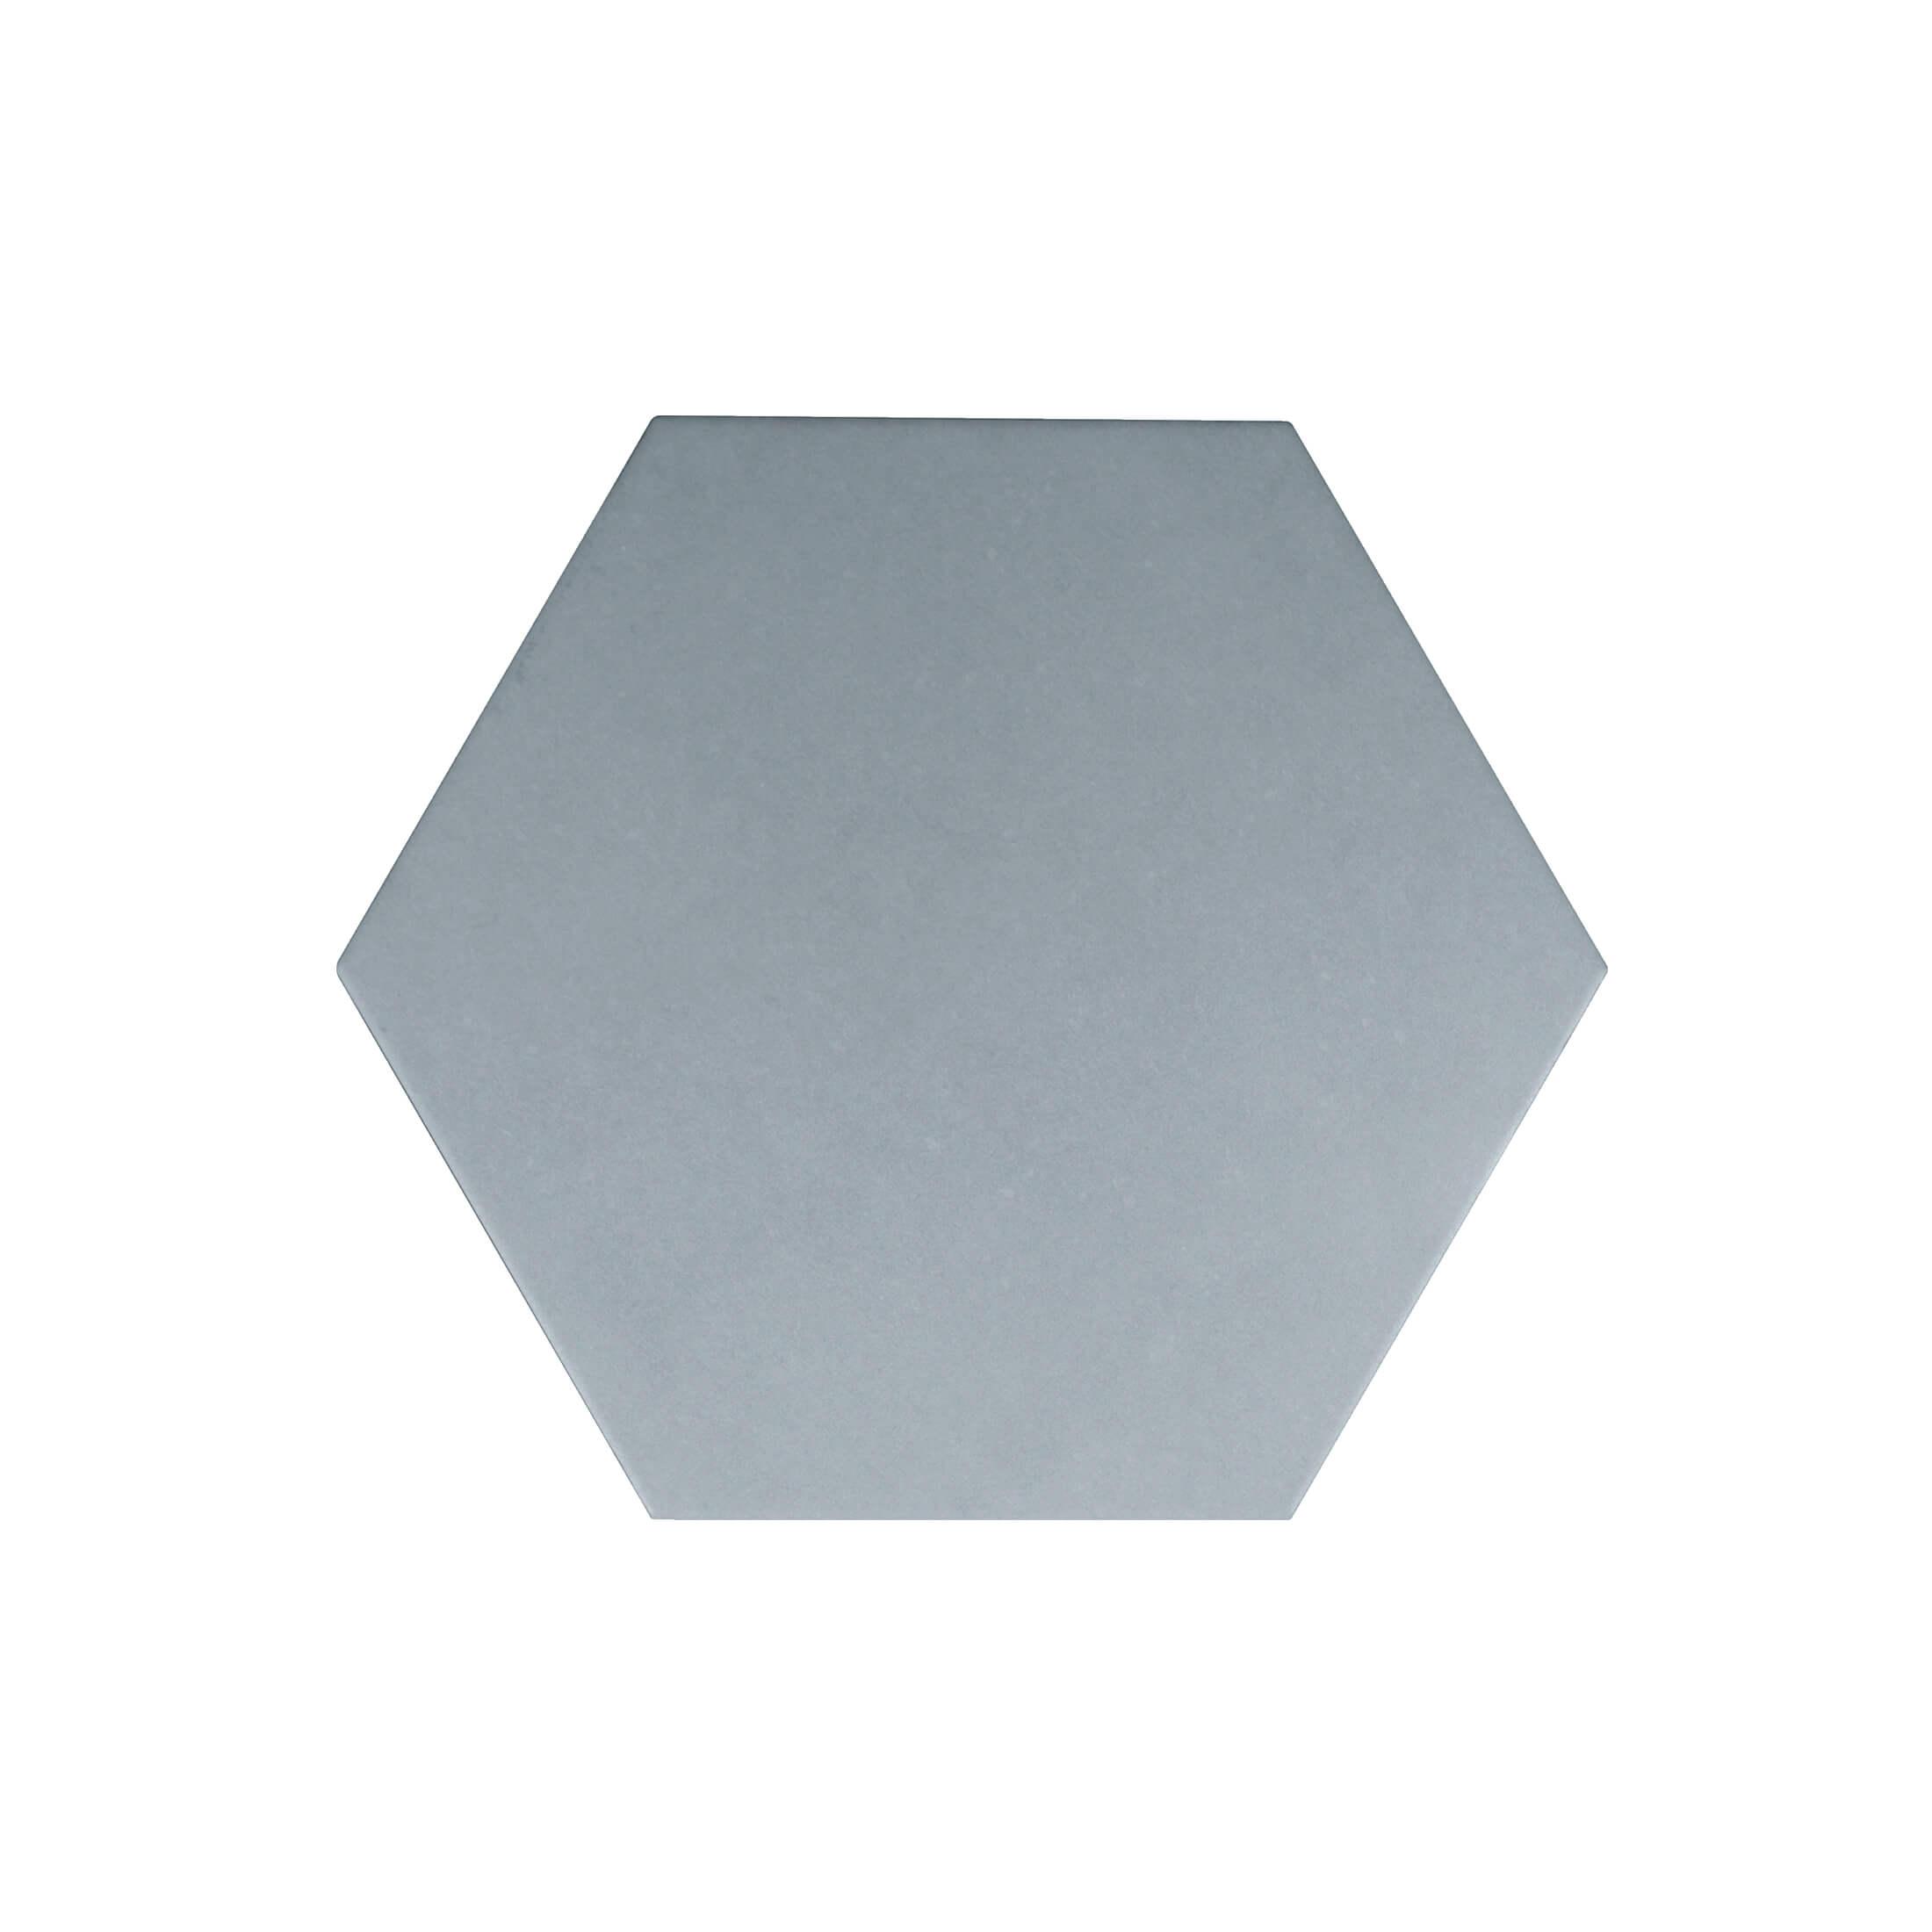 ADPV9016 - PAVIMENTO AZURE - 20 cm X 2,3 cm